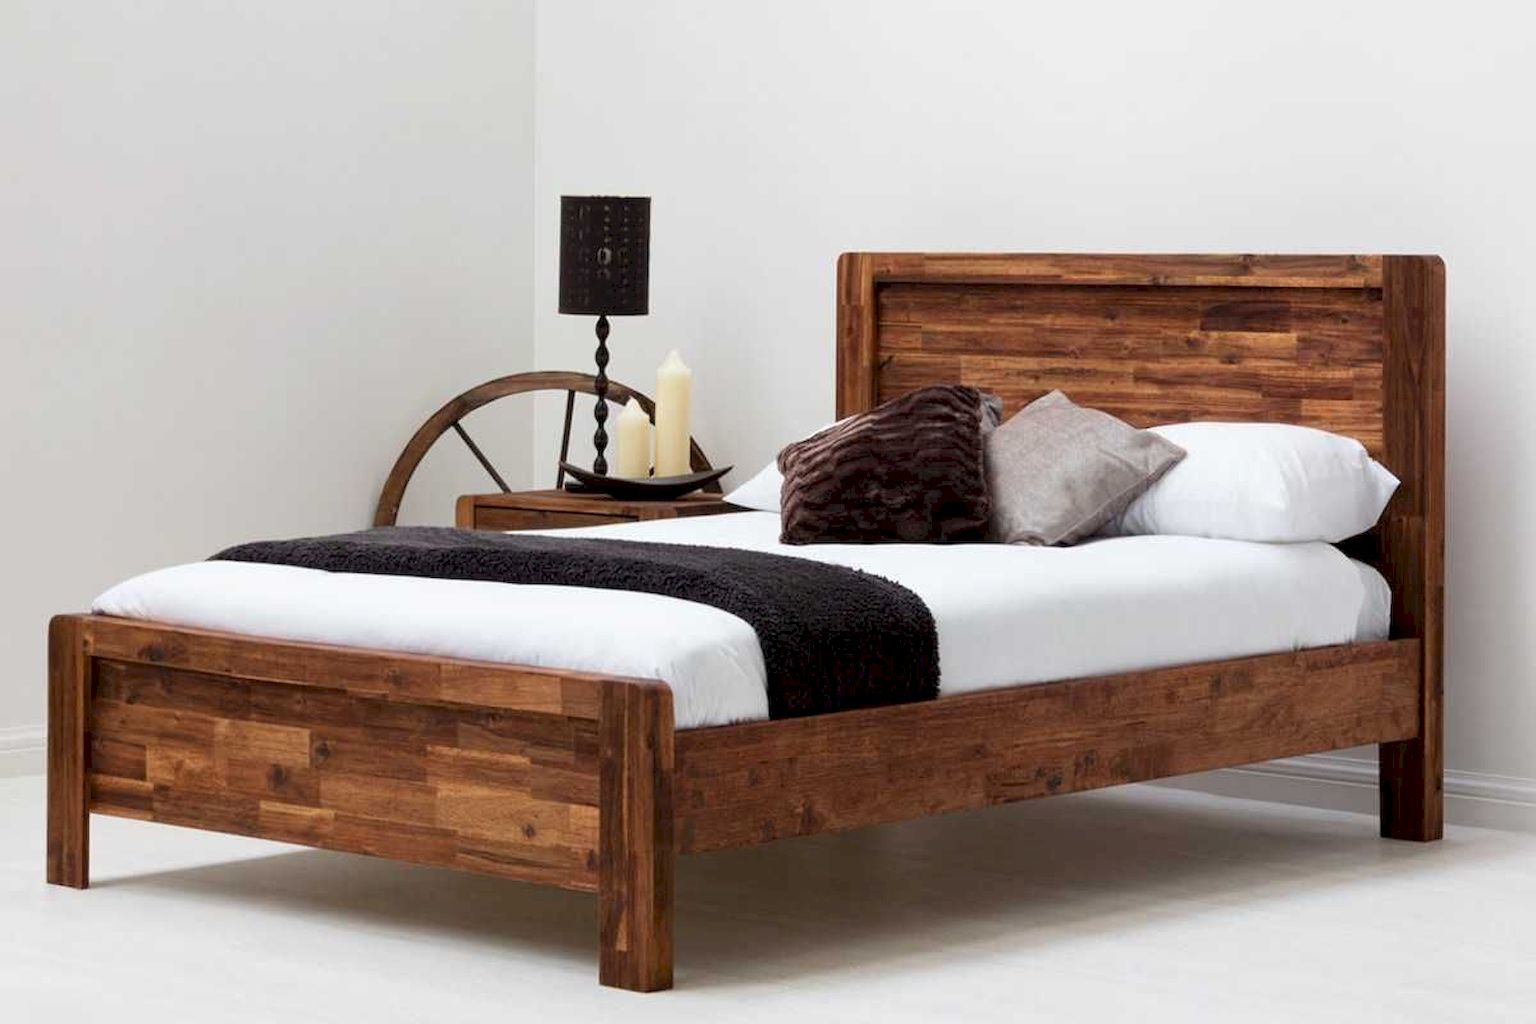 Wooden Furniture061